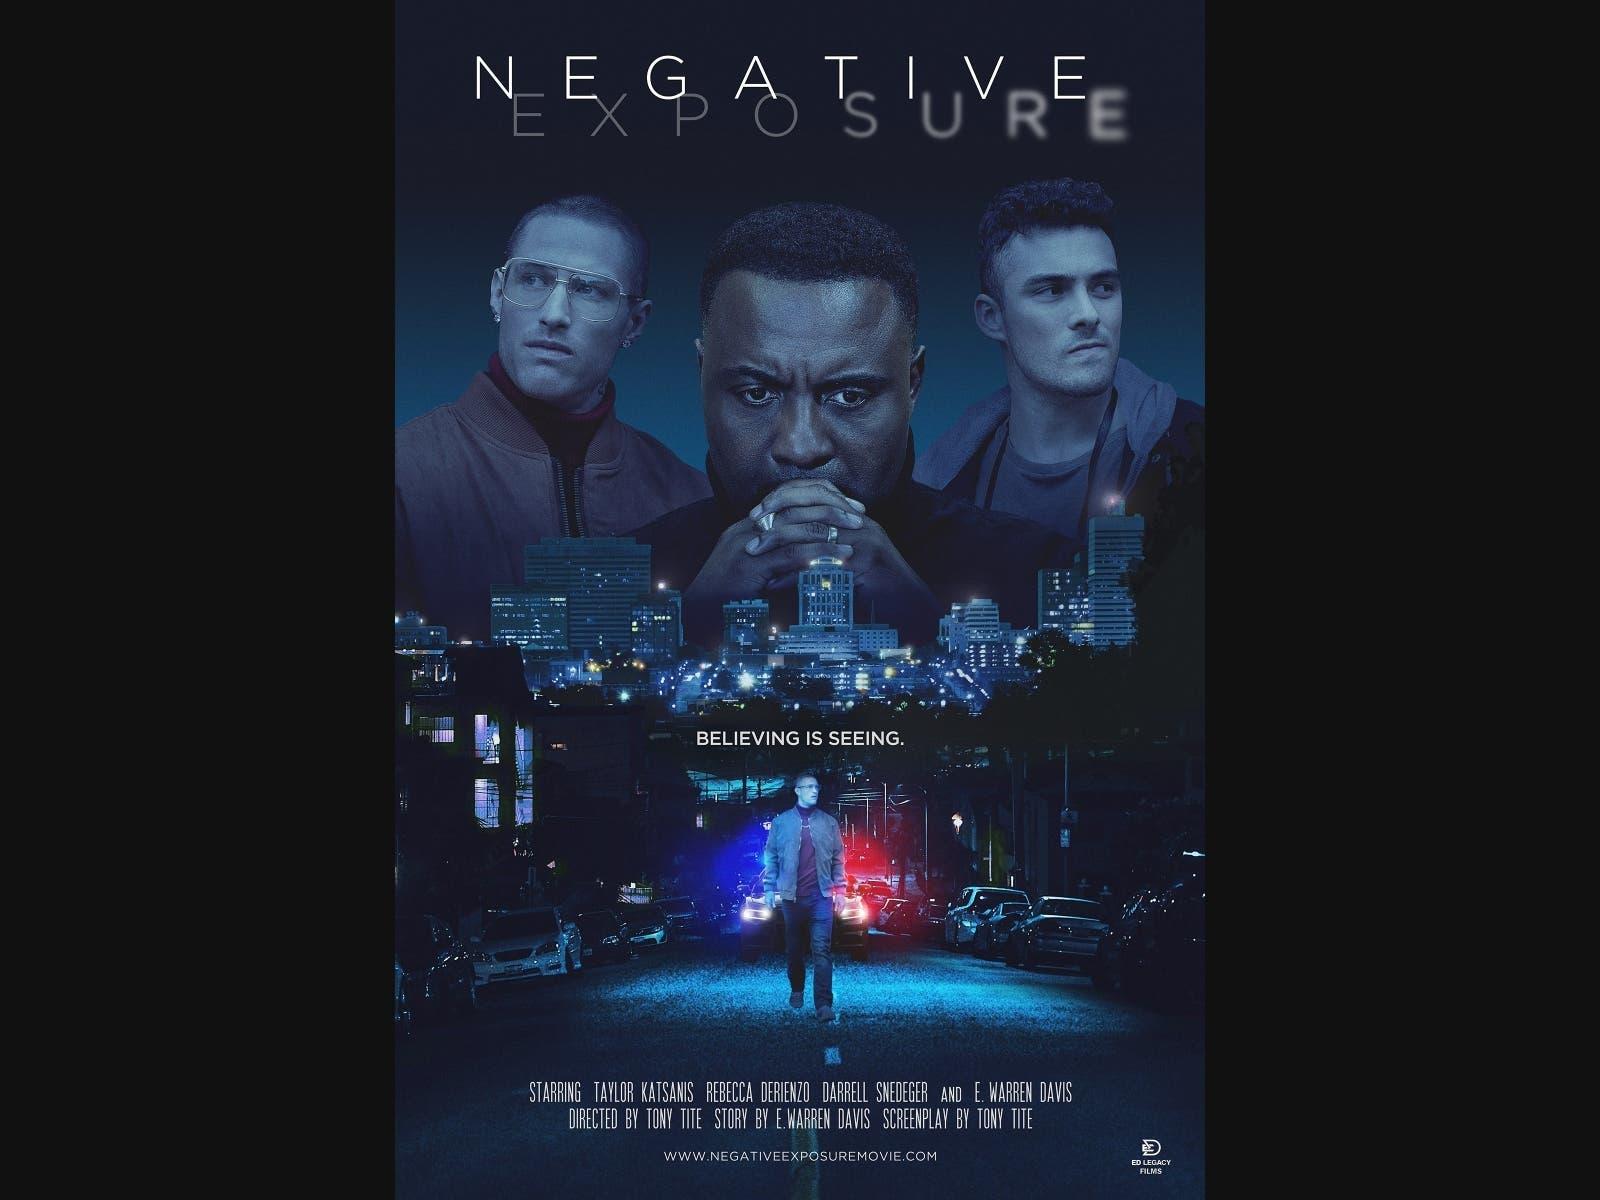 Negative Exposure Movie Release Date August 8, 2020   Cascade, GA Patch